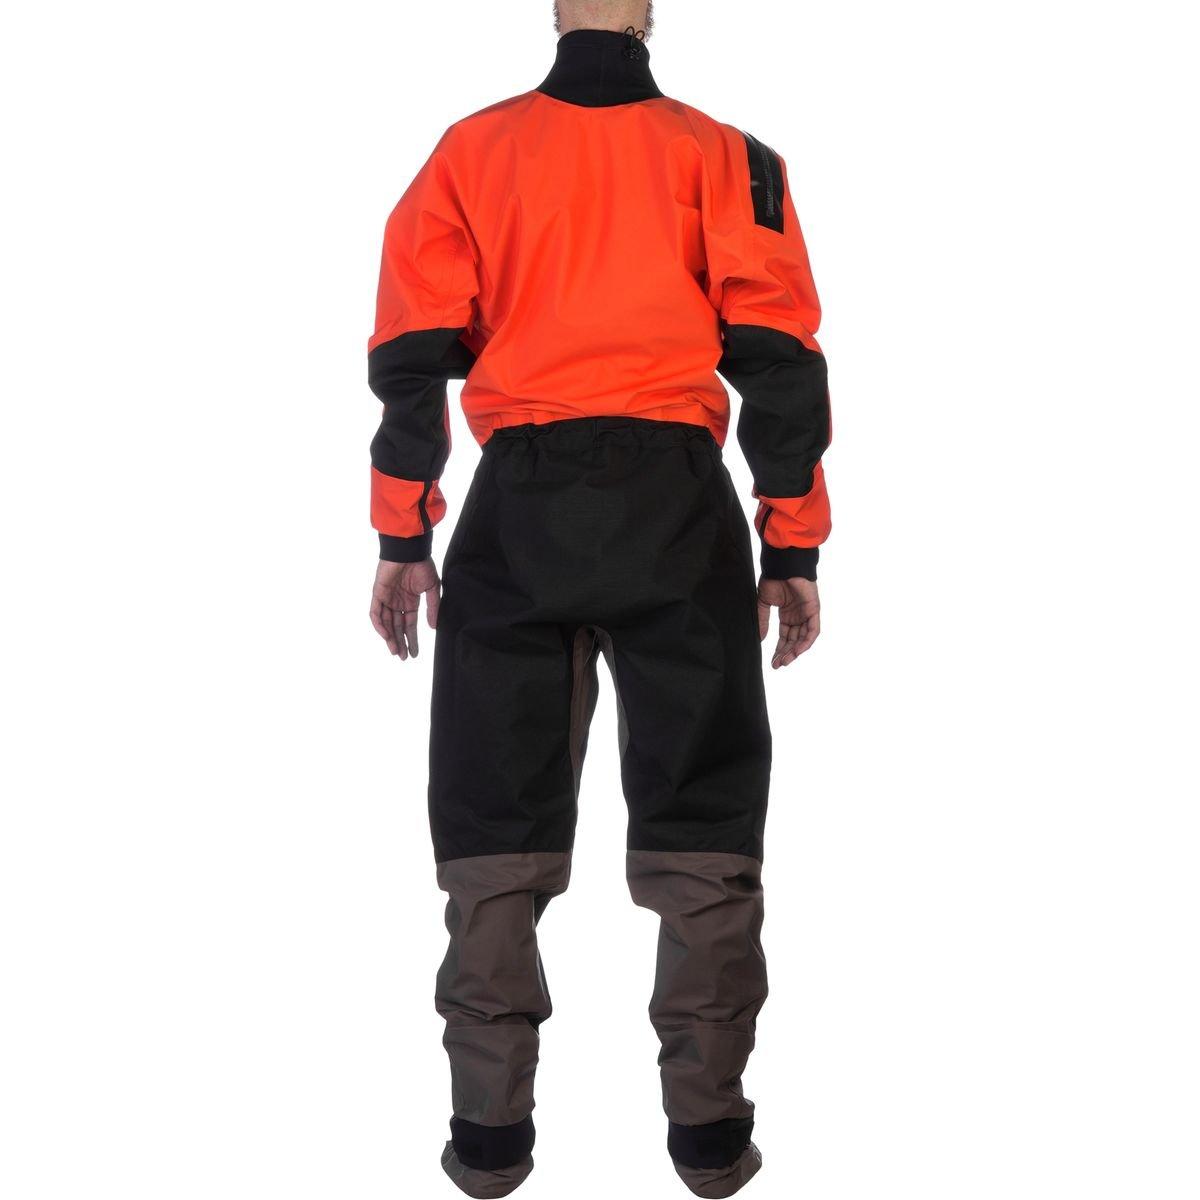 Kokatat Hydrus 3L SuperNova Angler Paddling Suit Tangerine M